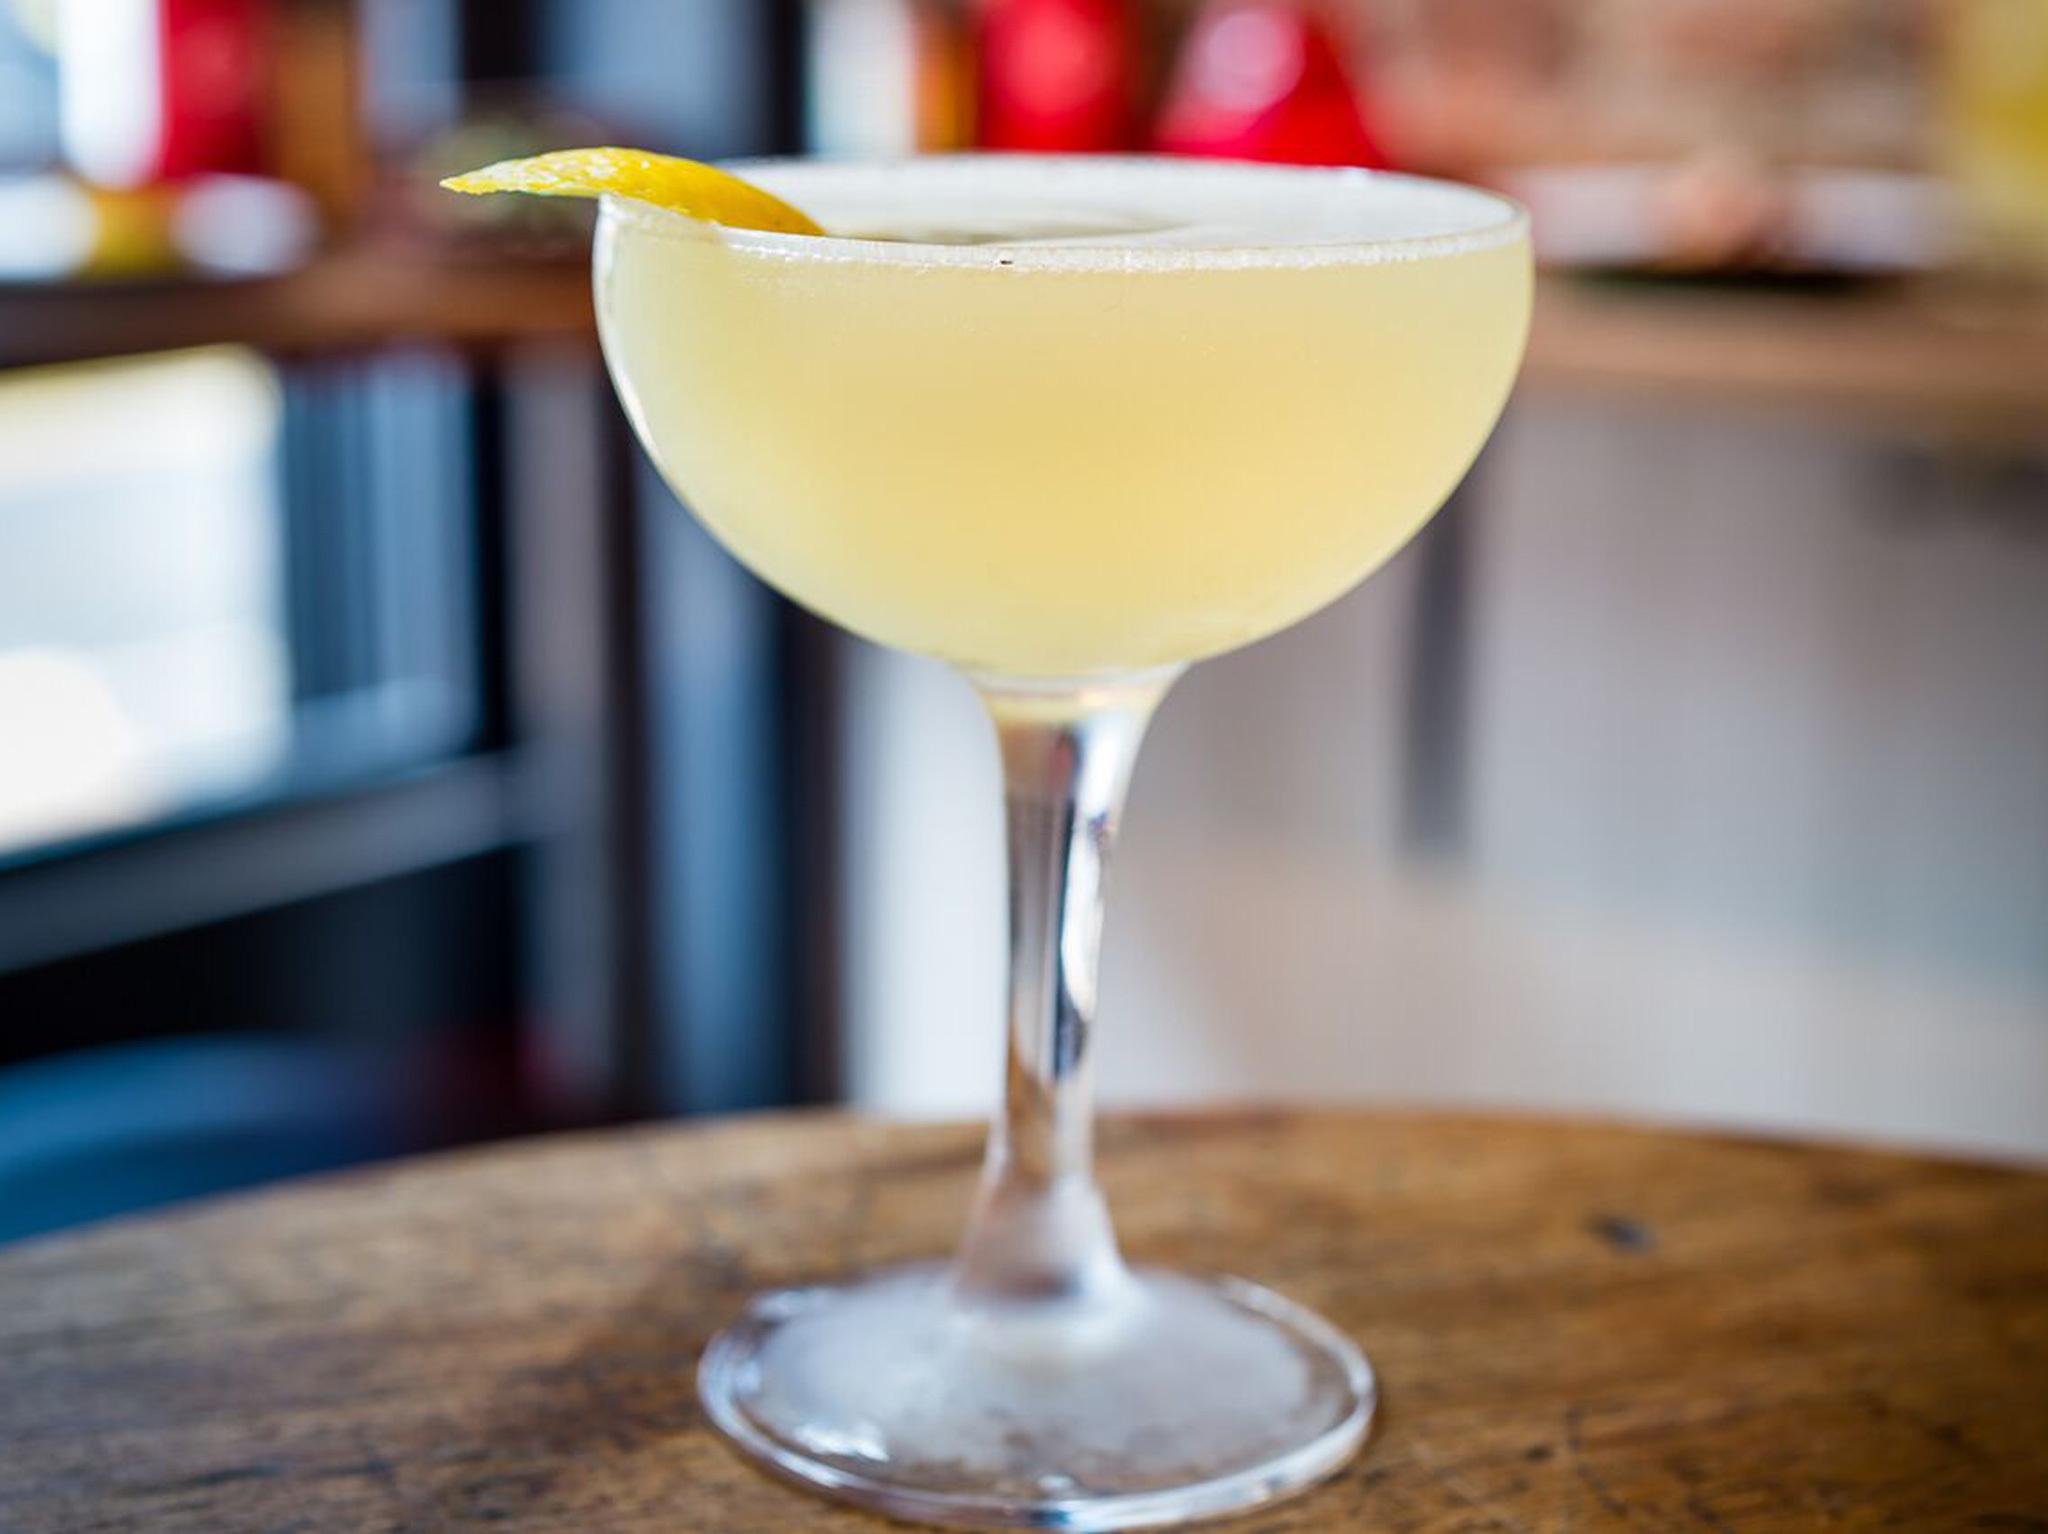 London's best restaurants for drinking cocktails - Patty & Bun